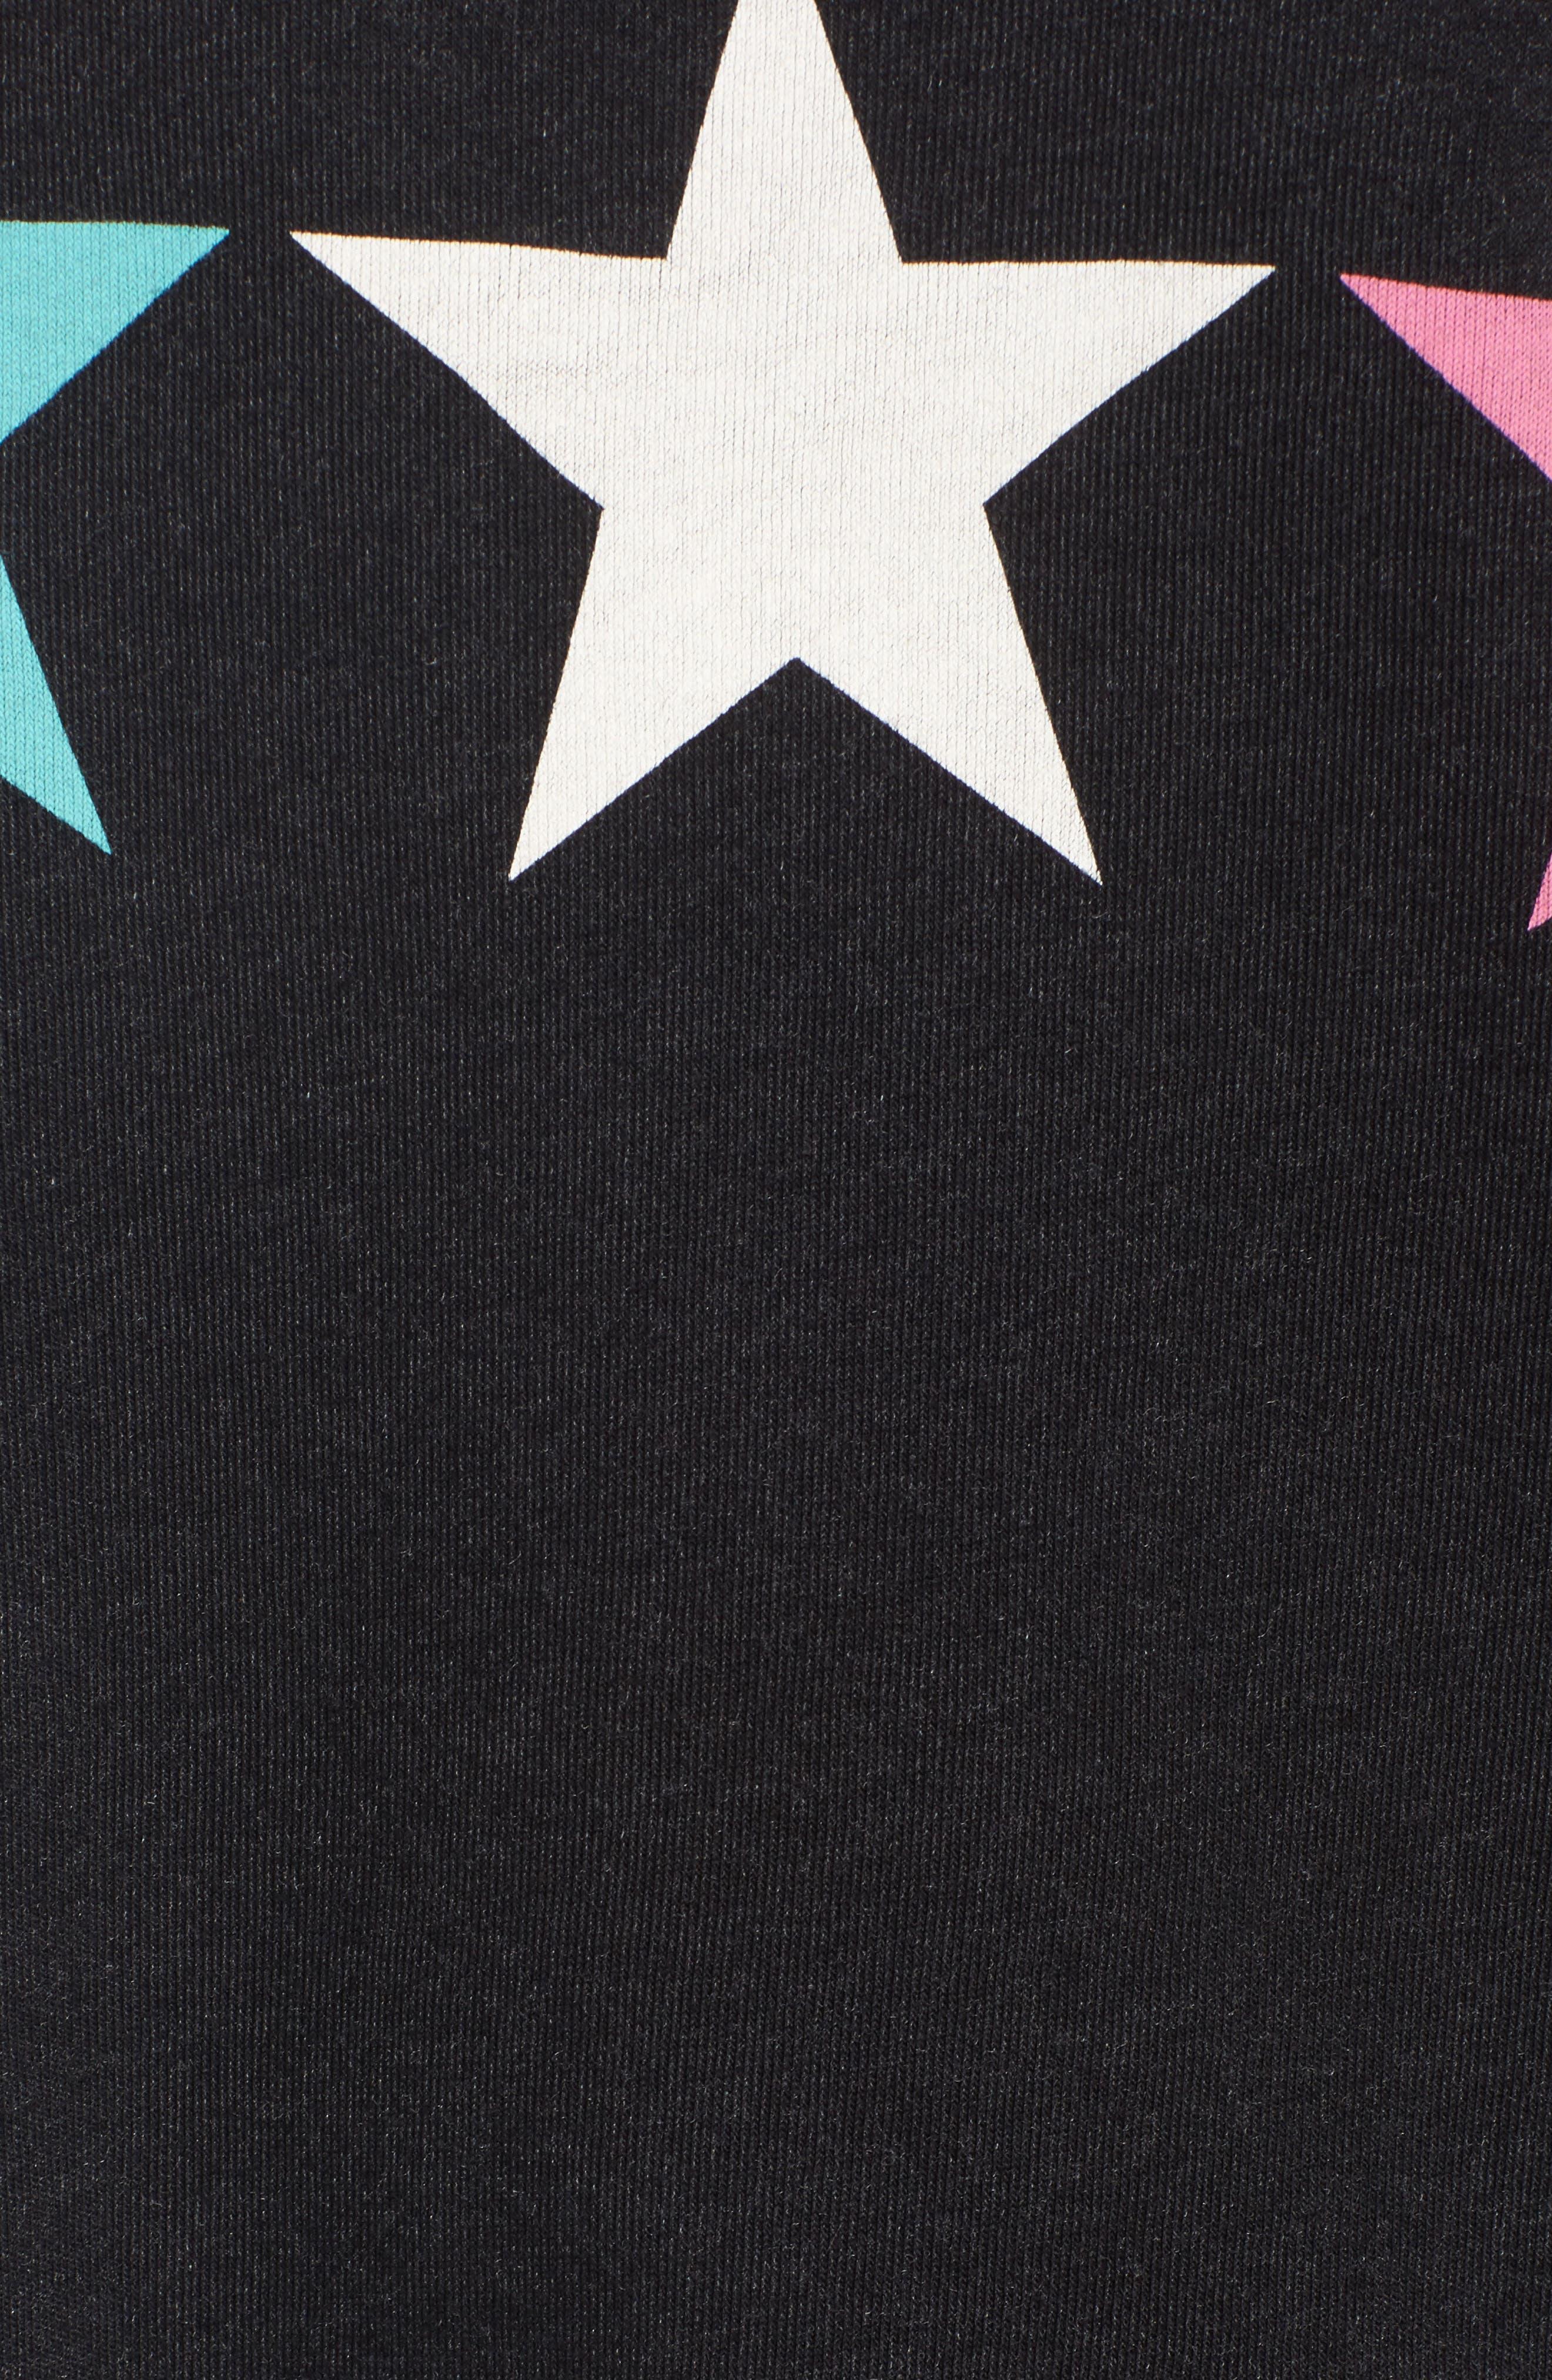 Arcade Stars Sommers Sweatshirt,                             Alternate thumbnail 5, color,                             001